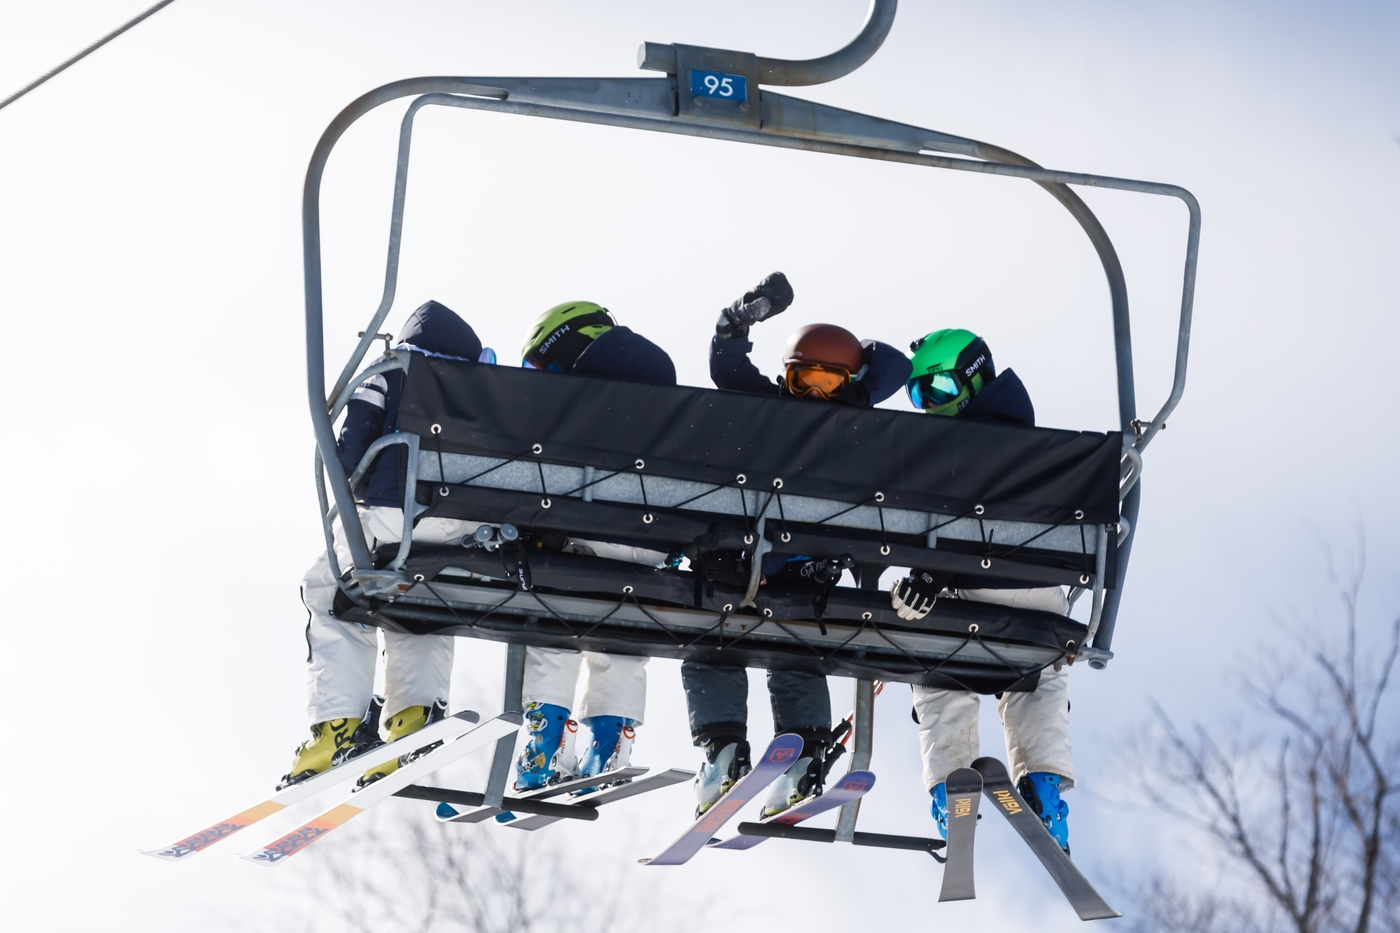 WinterKids Downhill 24 2021 SDP 3151